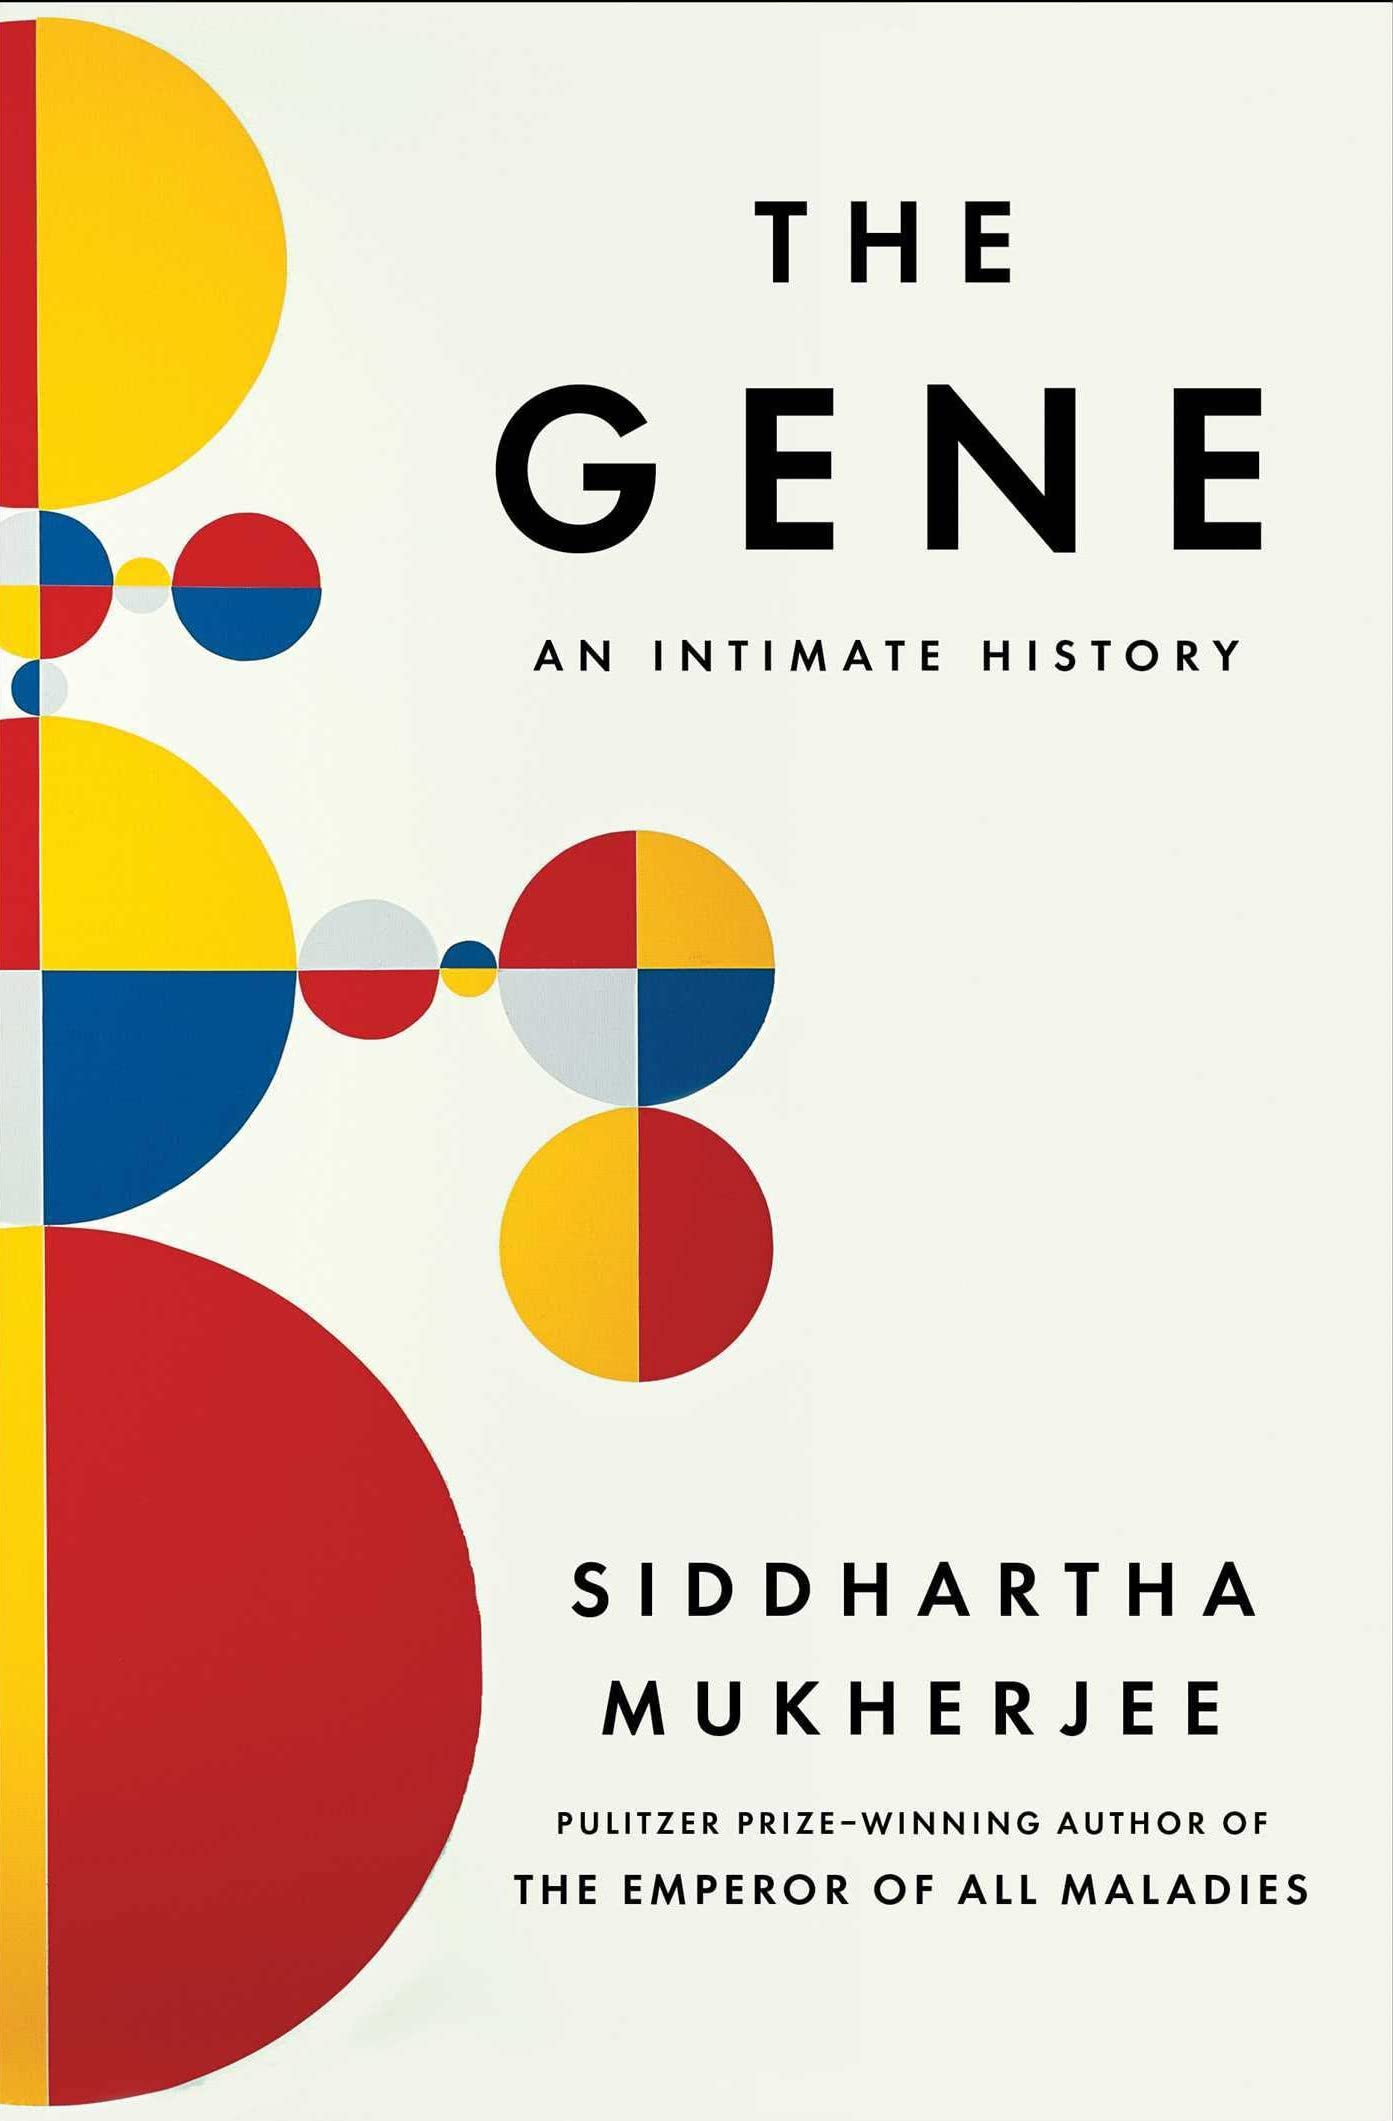 The Gene by Siddhartha Mukherjee